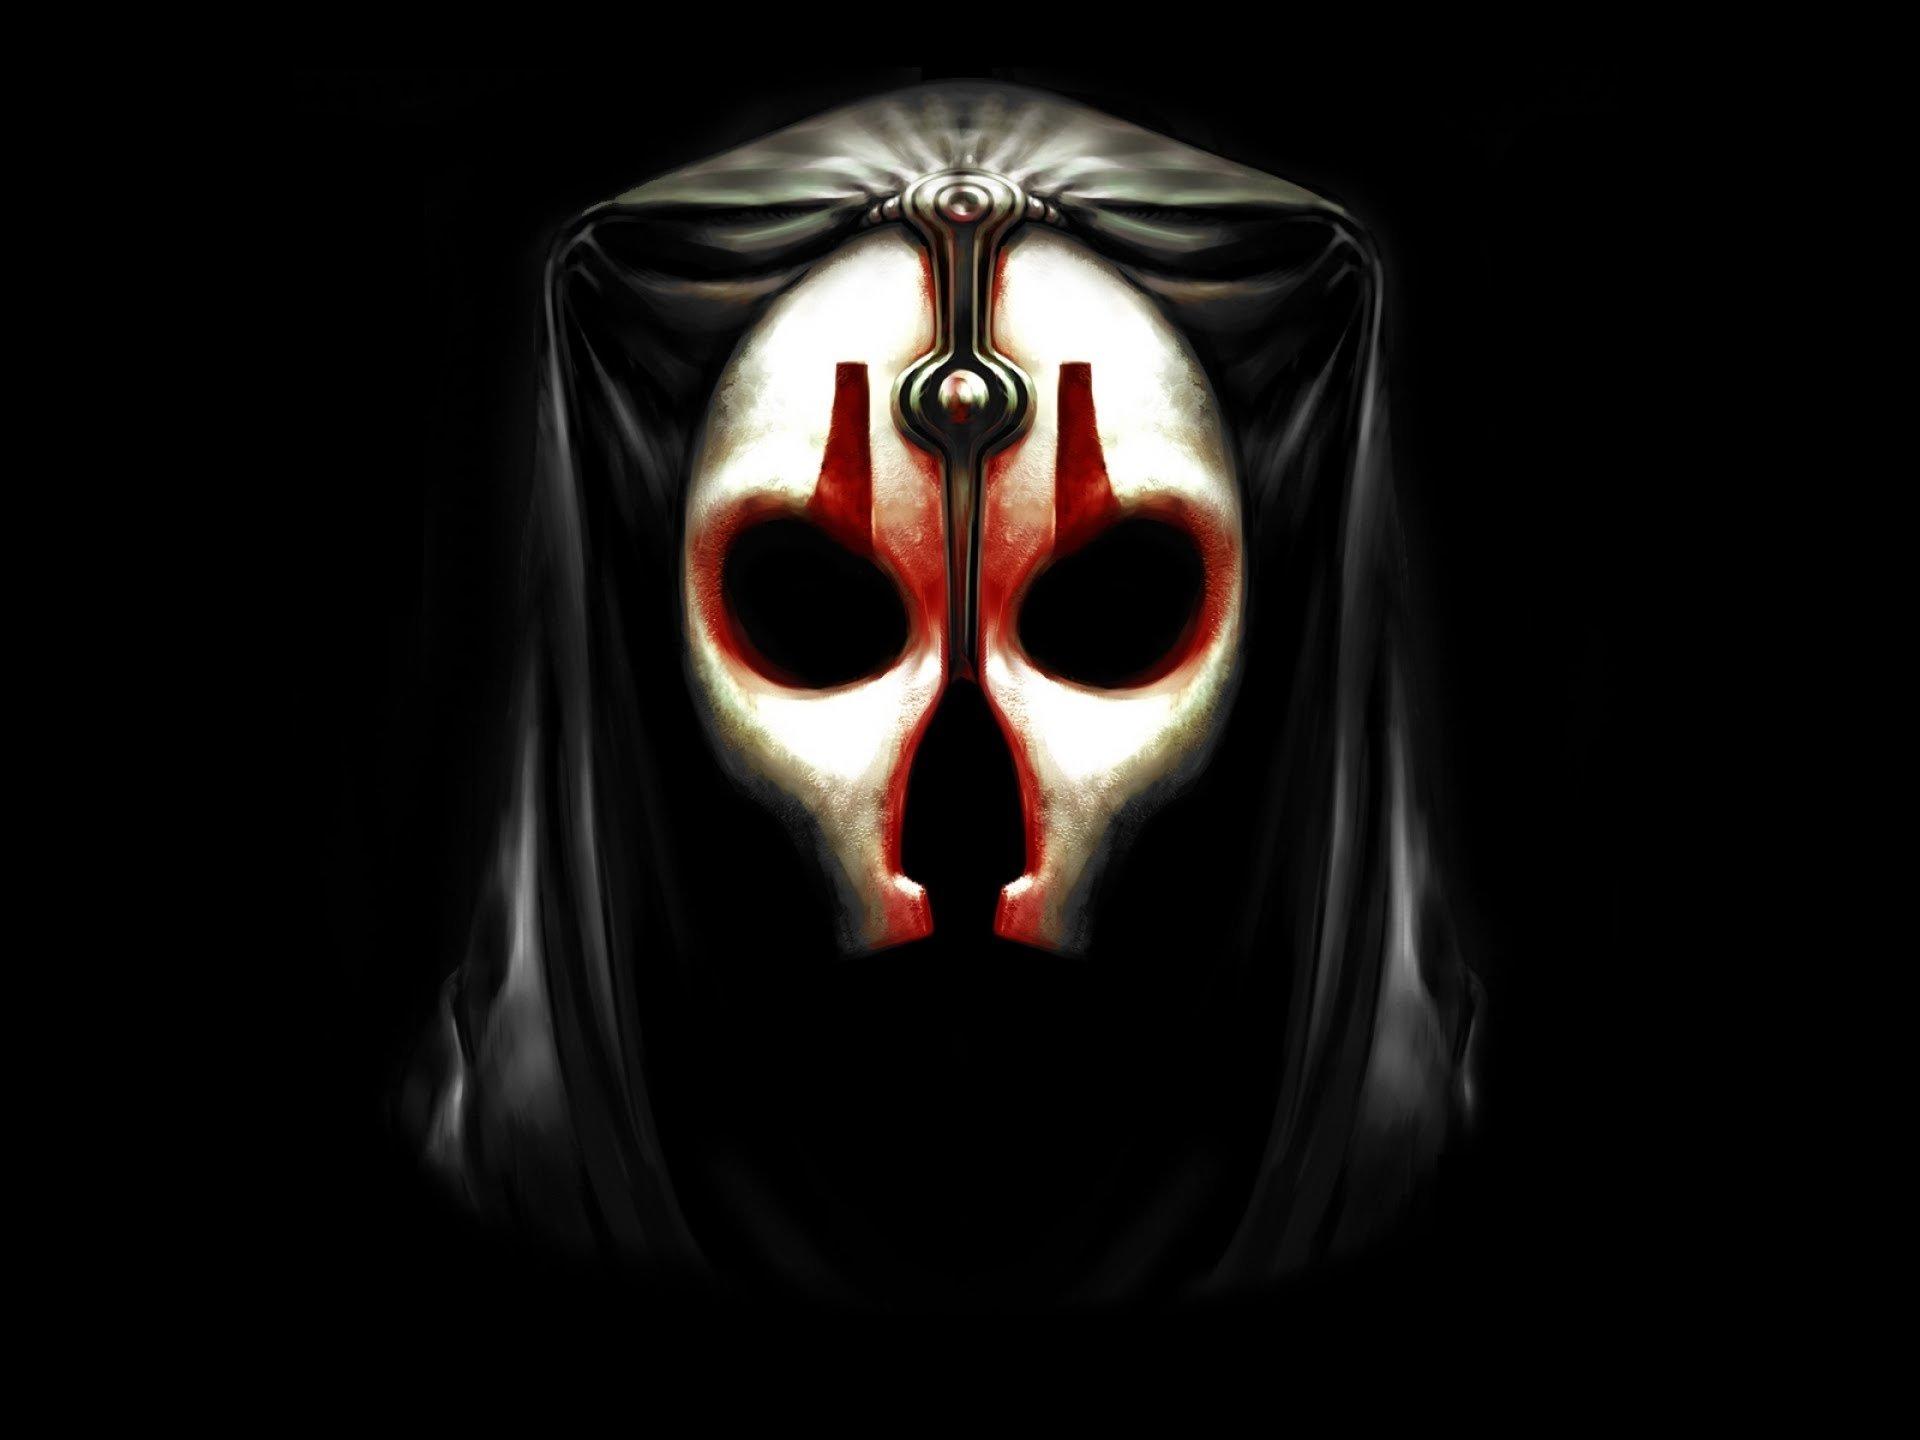 Cool Wallpaper Halloween Star Wars - 017b33747d1a1eb35e8b0ff35e00977d  You Should Have_28643.jpg